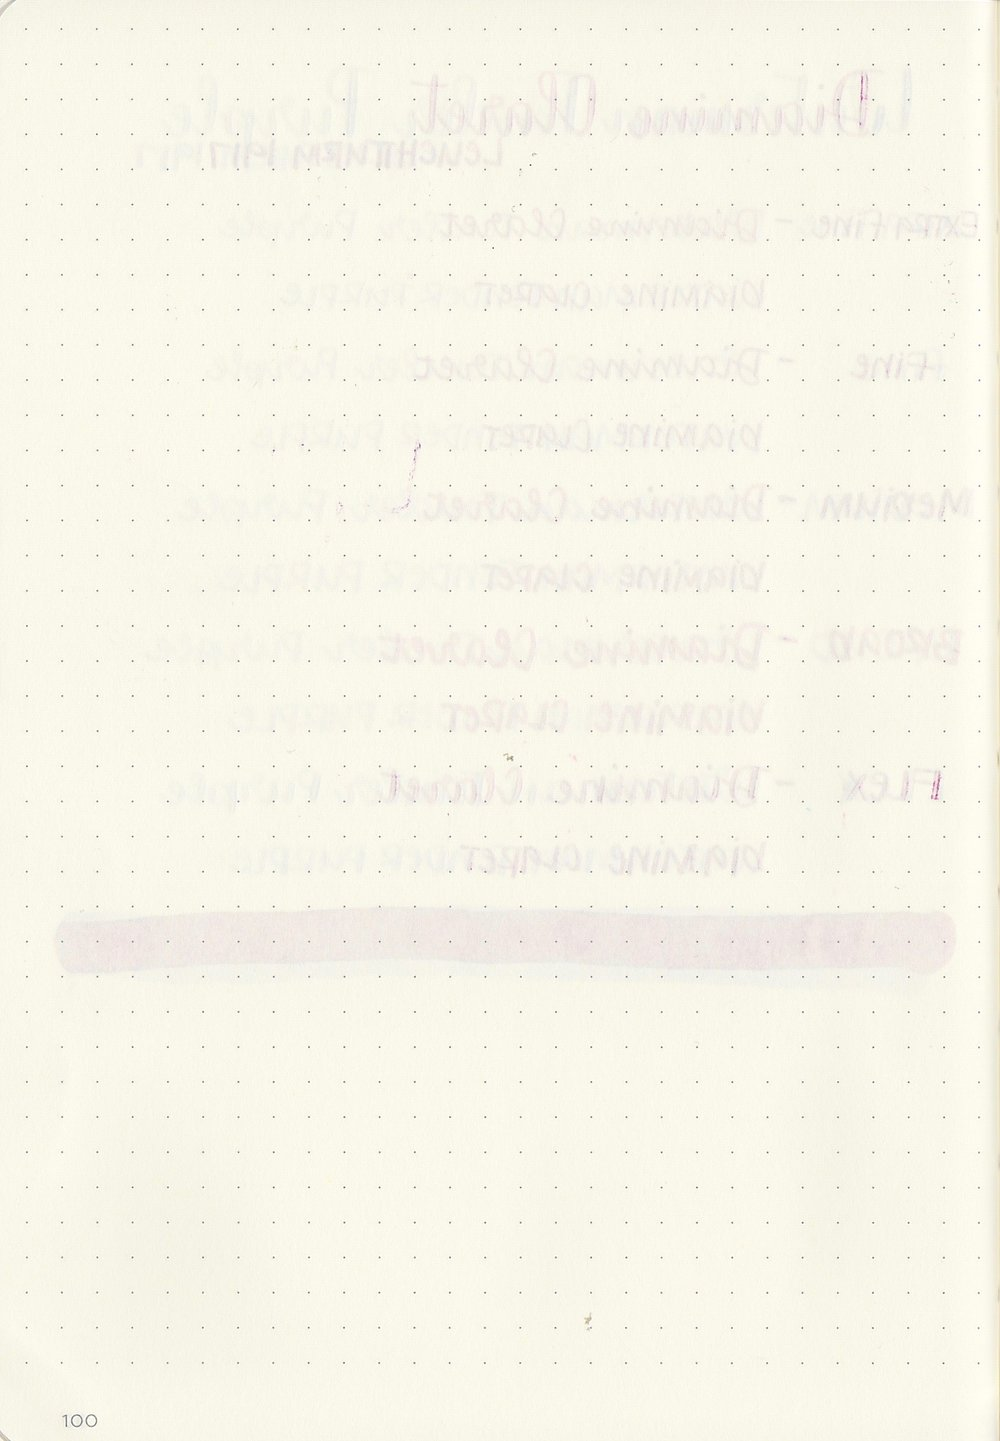 DiamineClaret - 12.jpg